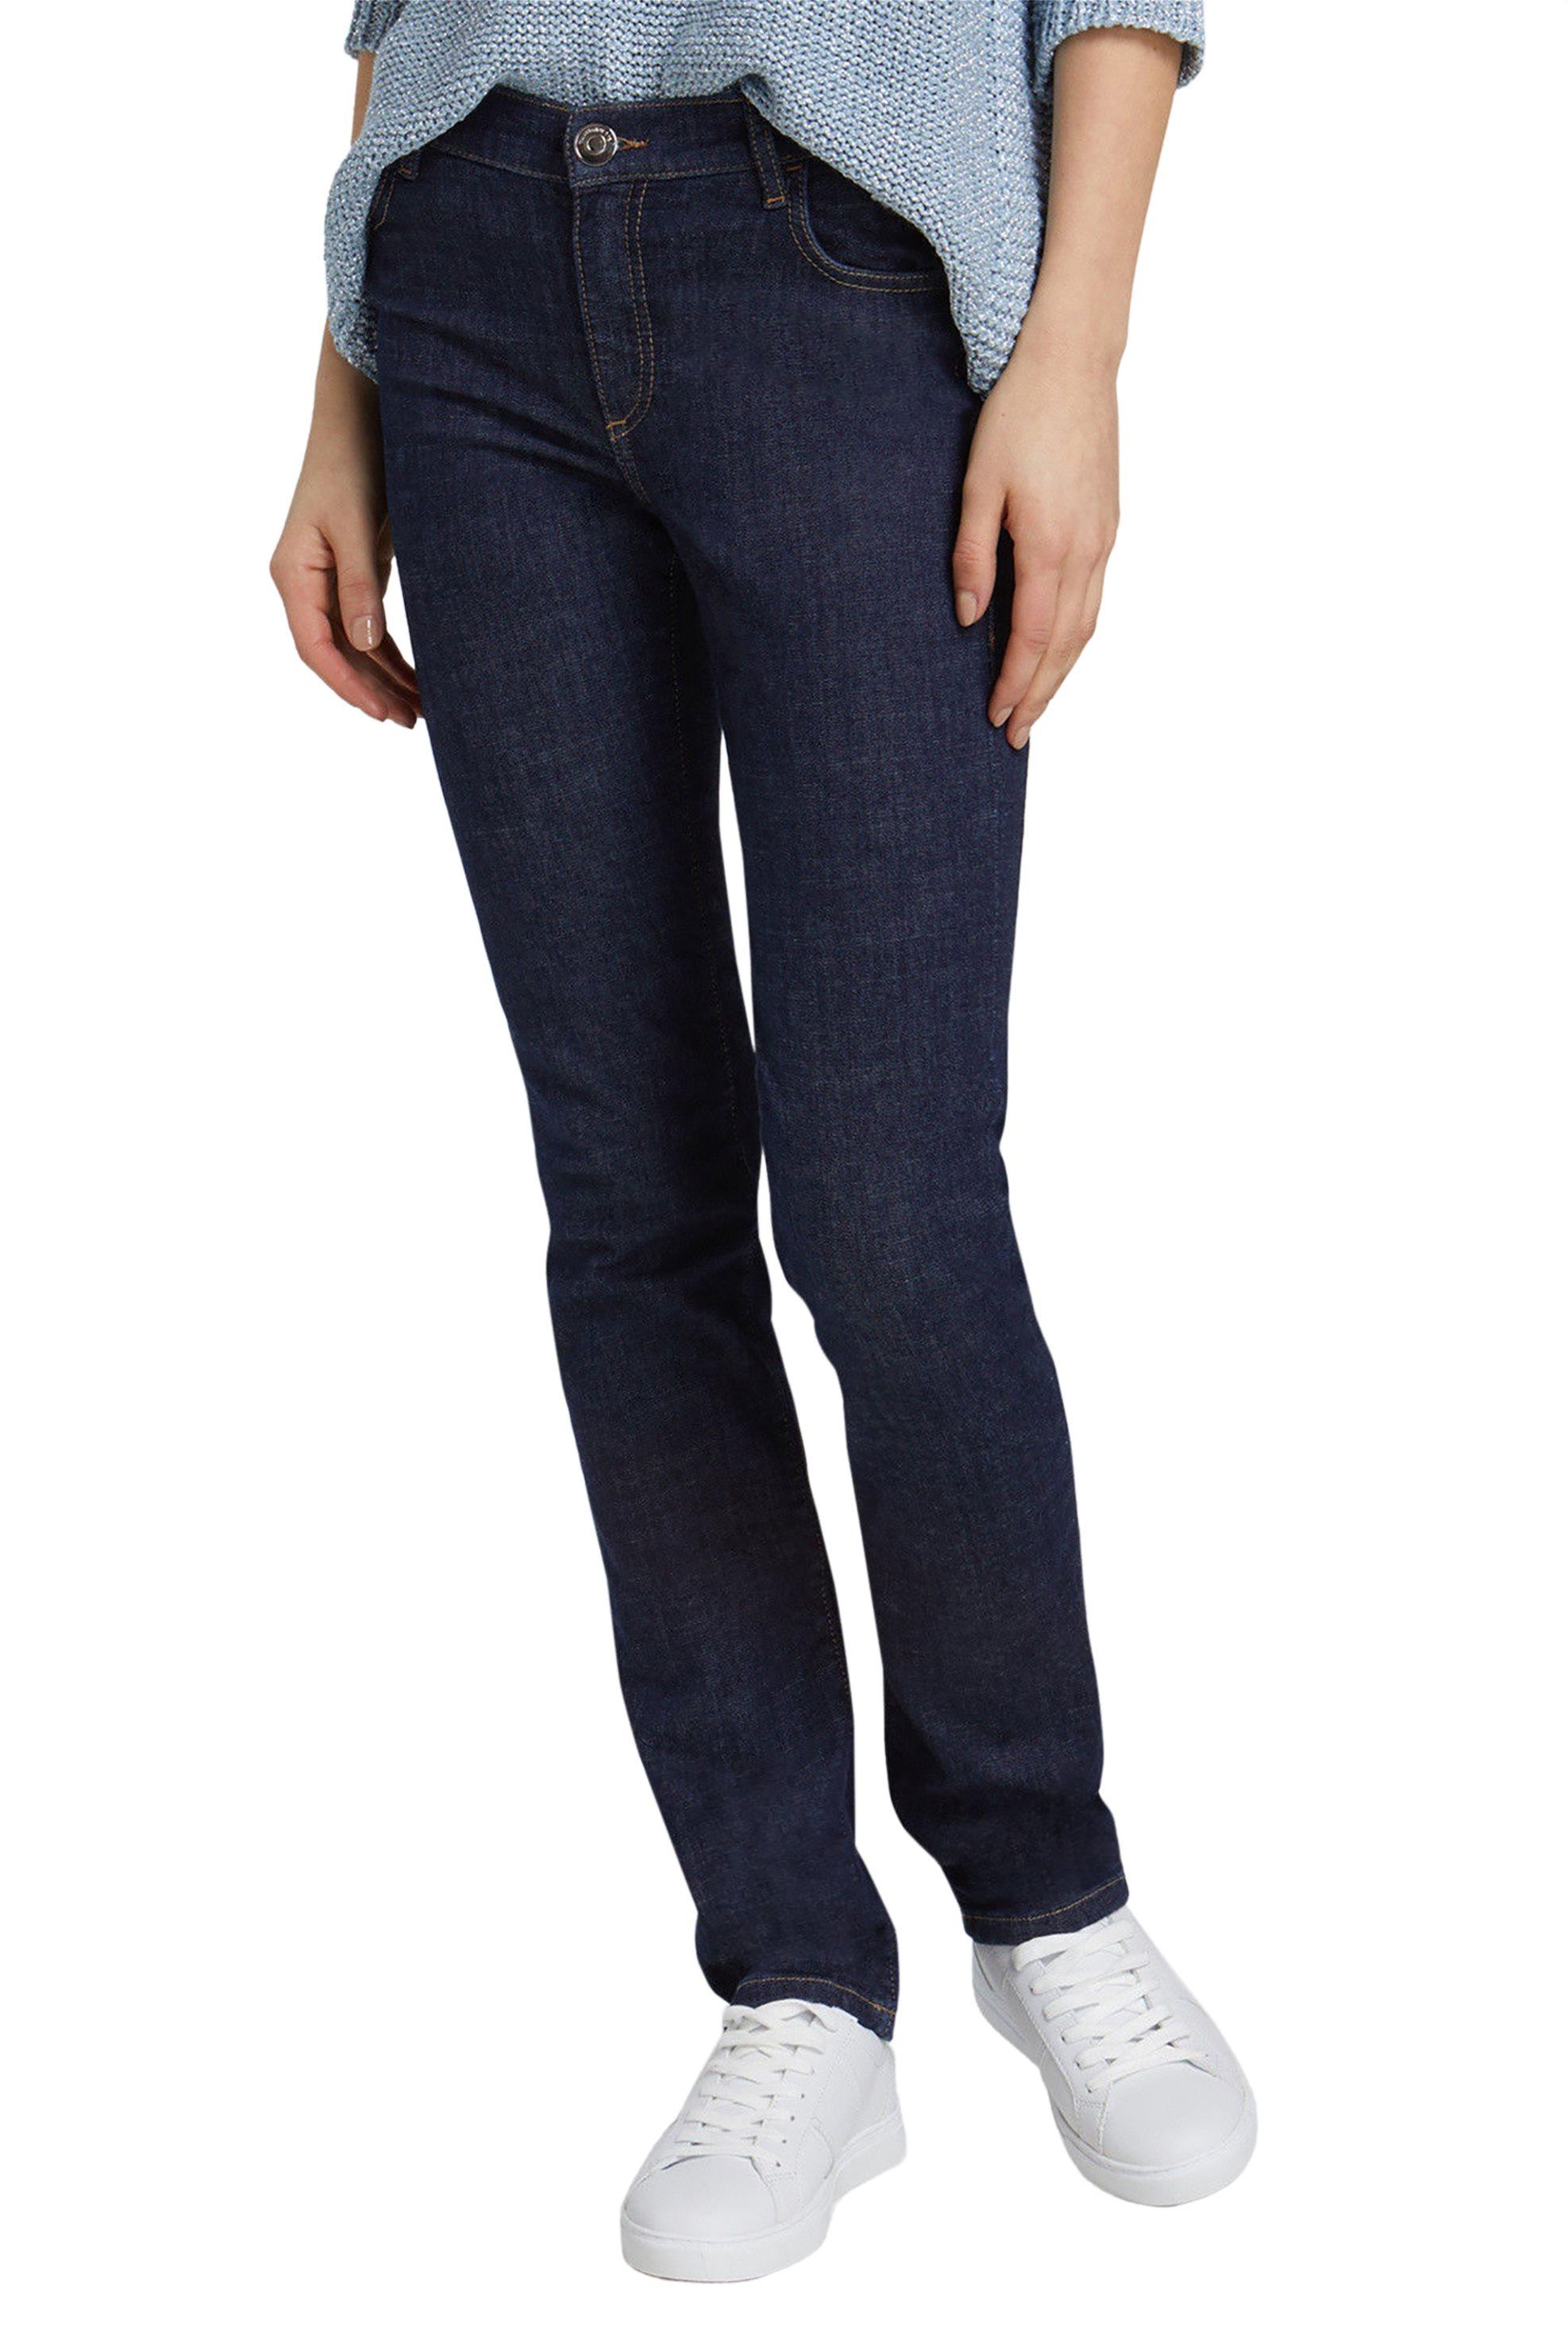 785017b4727c Notos Trussardi Jeans γυναικείο τζιν παντελόνι Classic Seasonal 130 -  56J00007-1T002365 - Μπλε Σκούρο